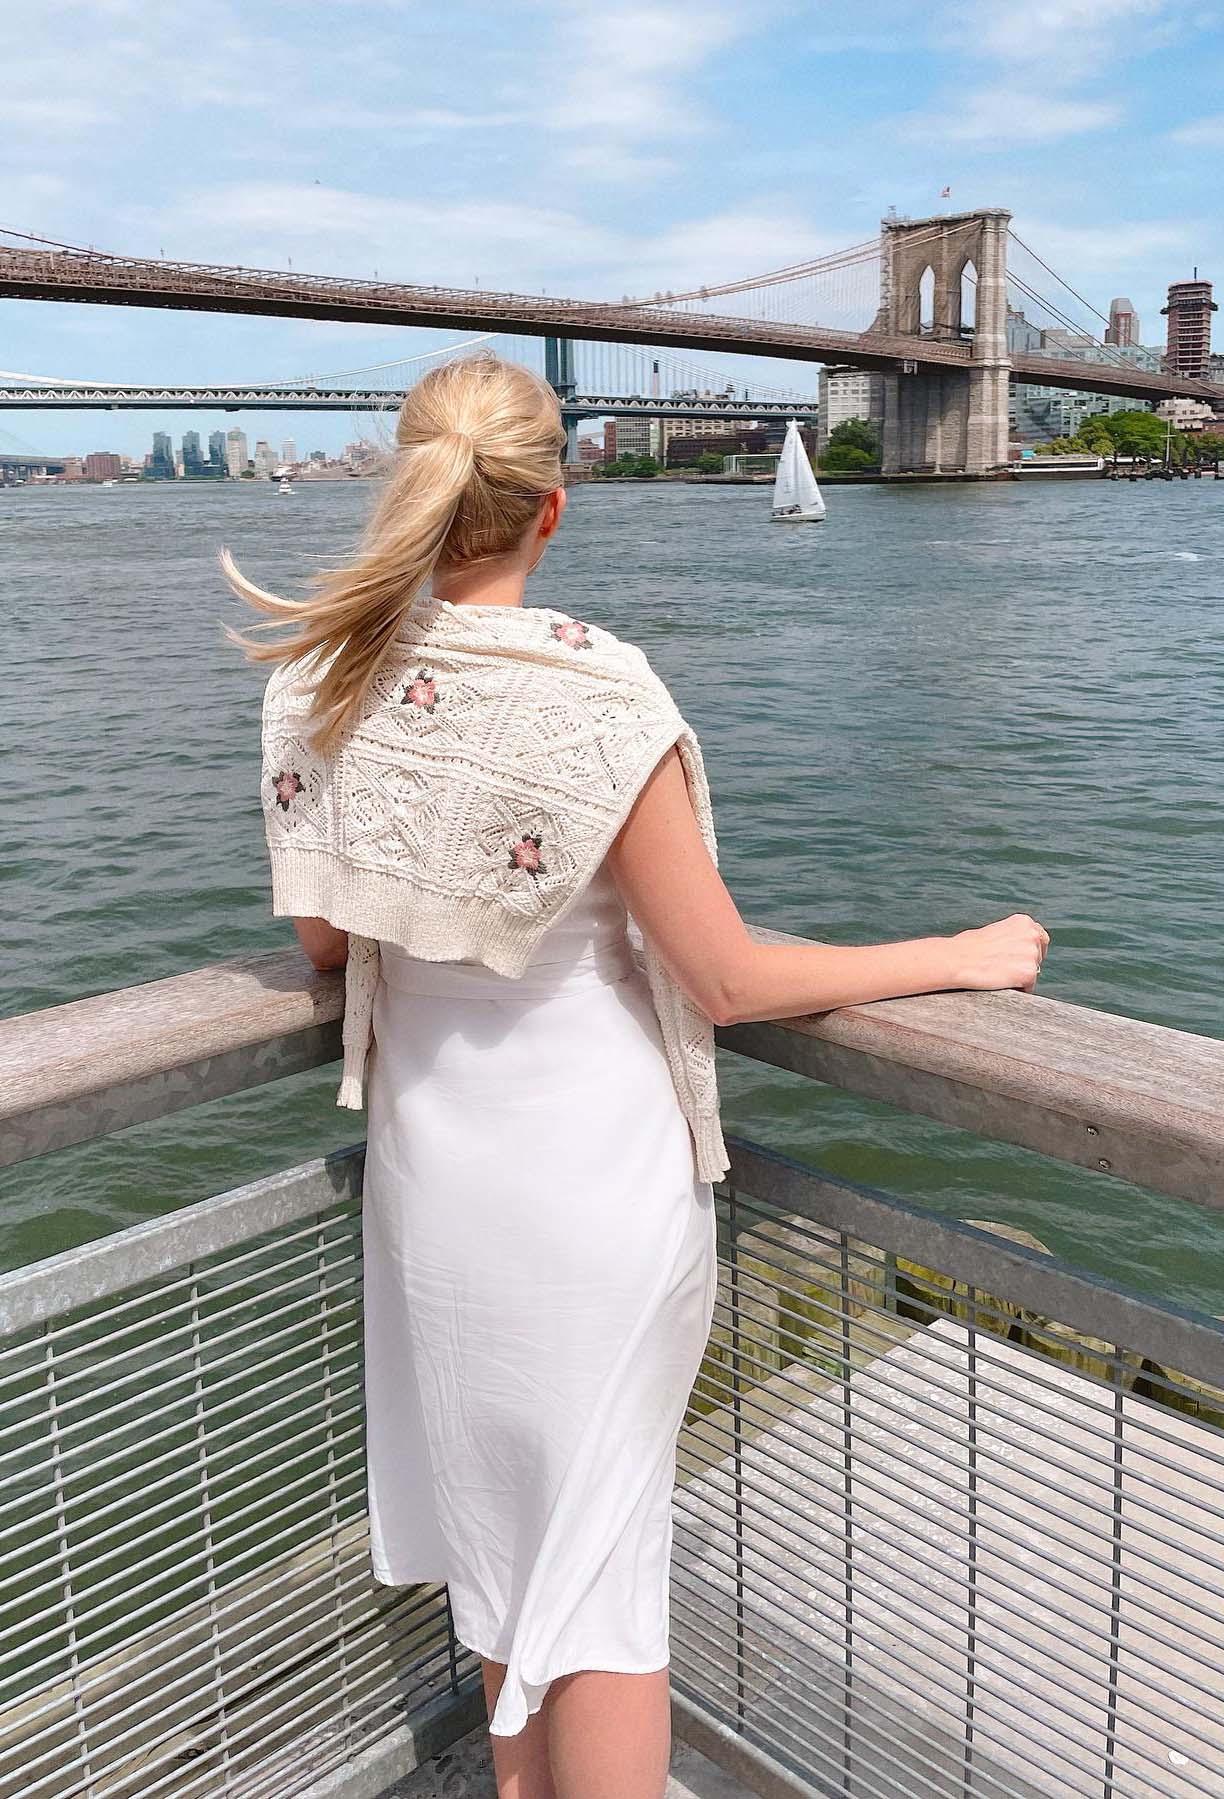 Pier 17 - Seaport New York City in 2021